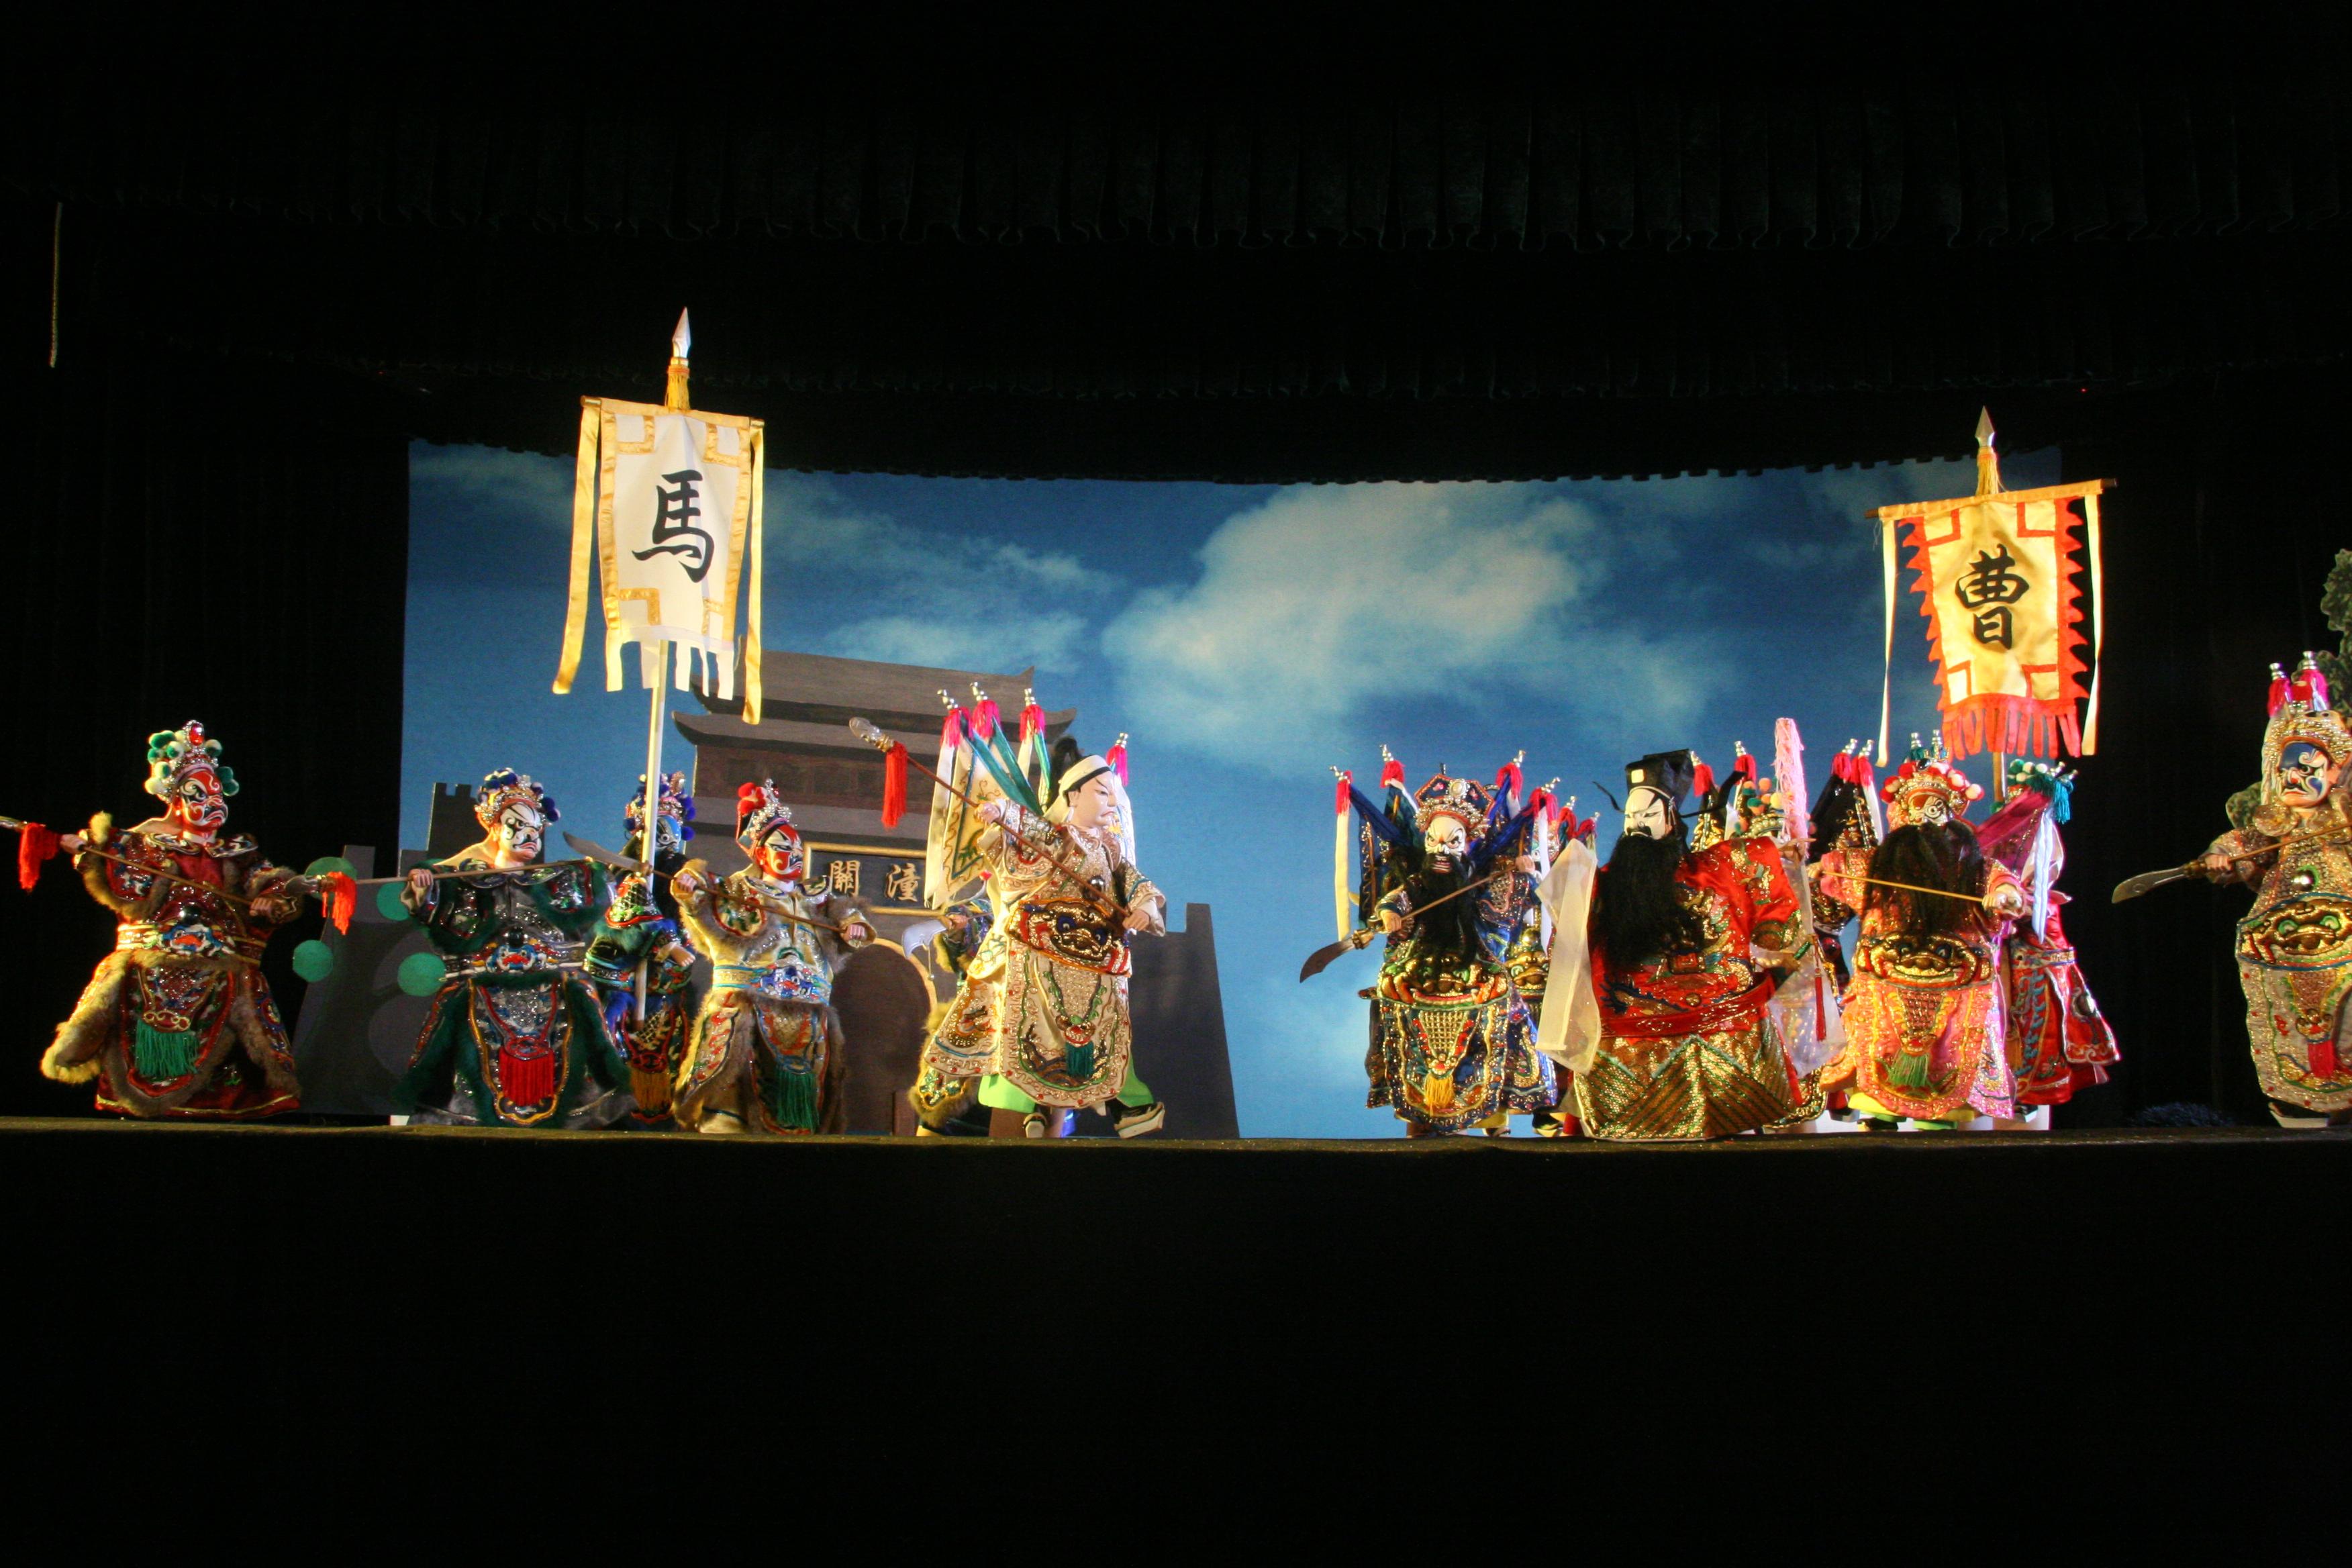 <em>La bataille à Tongguan</em> (战潼关, 1962) par Zhangzhoushi Muou Jutuan (District de Xiangcheng, Zhangzhou, province du Fujian, République populaire de Chine), auteur : Yang Sheng (décédé), mise en scène : Hong Huijun, conception et fabrication : Yang Junwei, marionnettistes : Yao Wenjian, Wu Jinliang, Liang Zhihuang, Xu Kunhuang et d'autres. Marionnettes à gaine, hauteur : 45 cm. Photo: Chen Weiqi